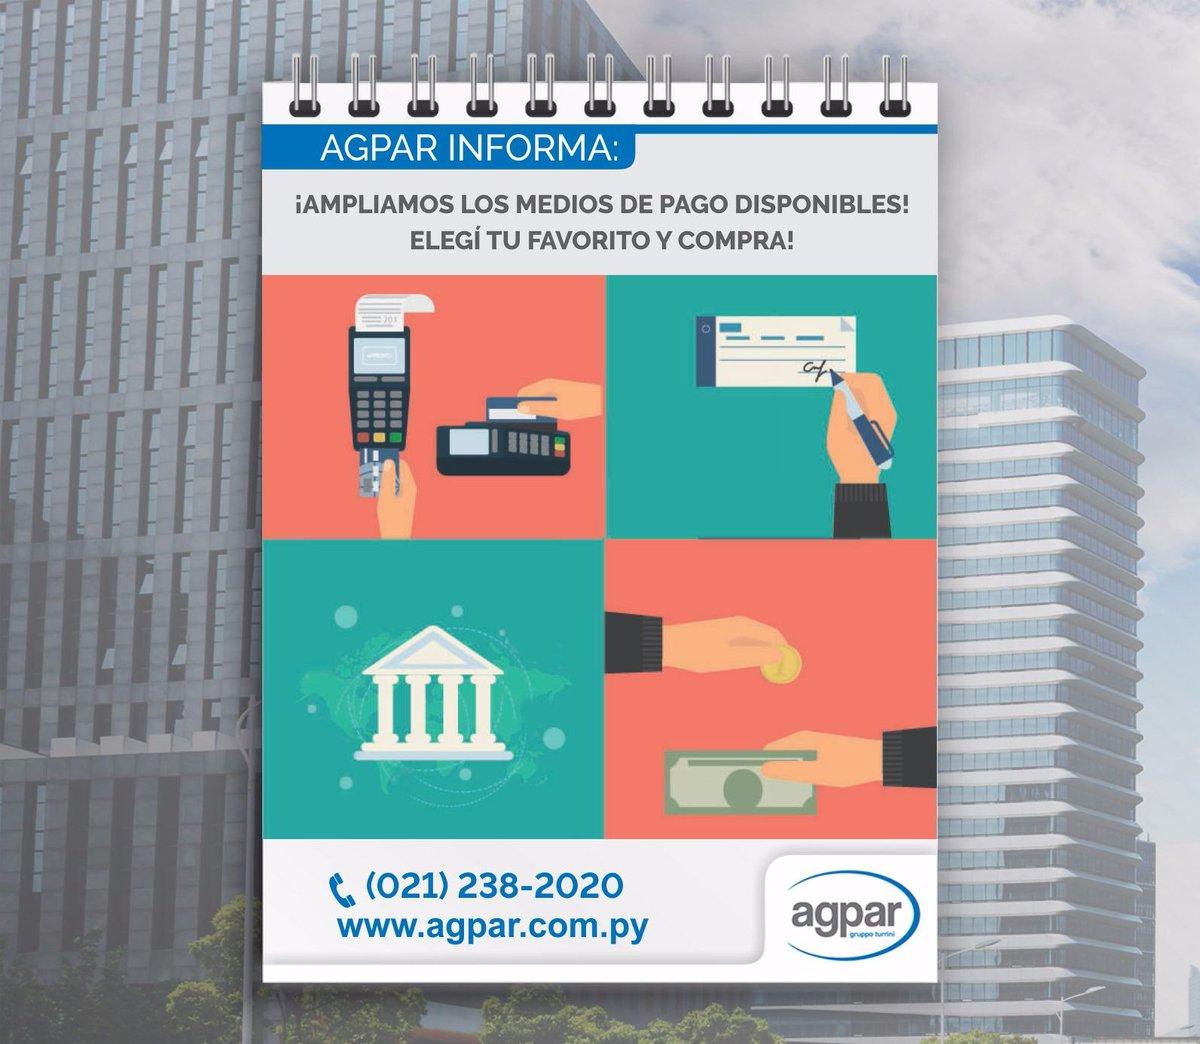 Recorda, en Agpar podes pagar como mejor te parezca! #agpar #pedidos https://t.co/tCmEF05IuU